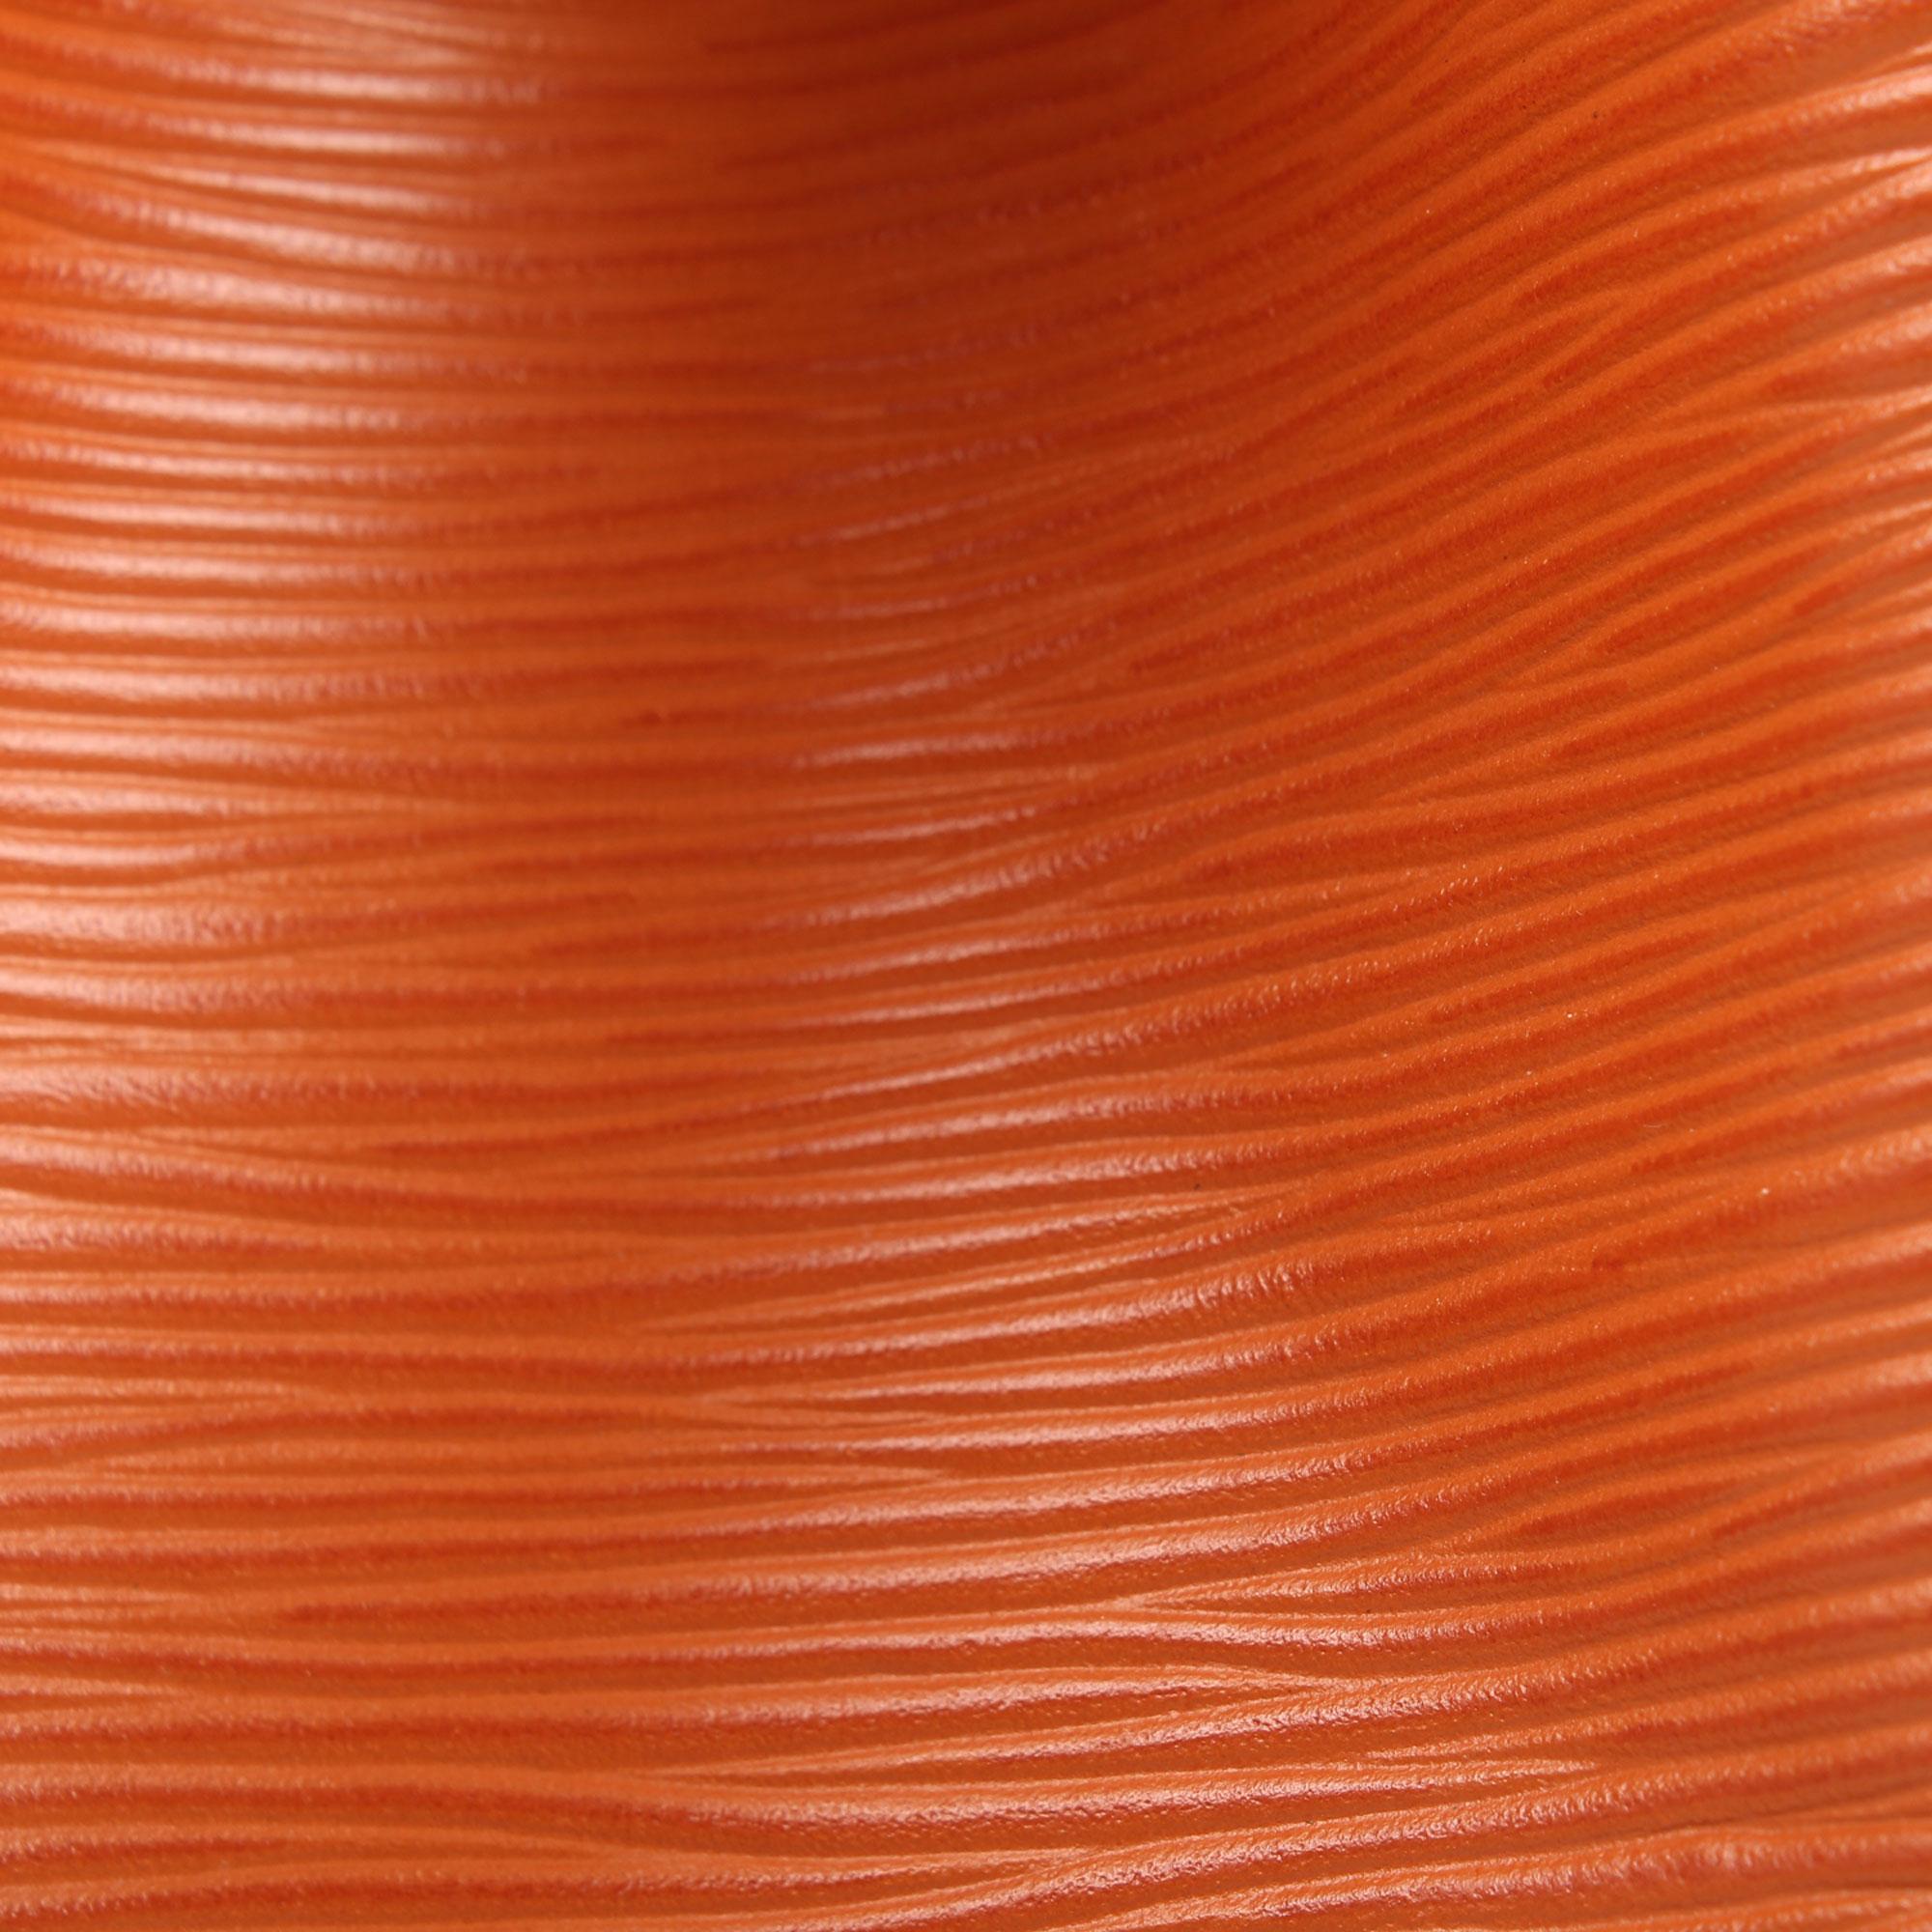 Imagen del detalle de la piel del bolso louis vuitton noe piel epi marron